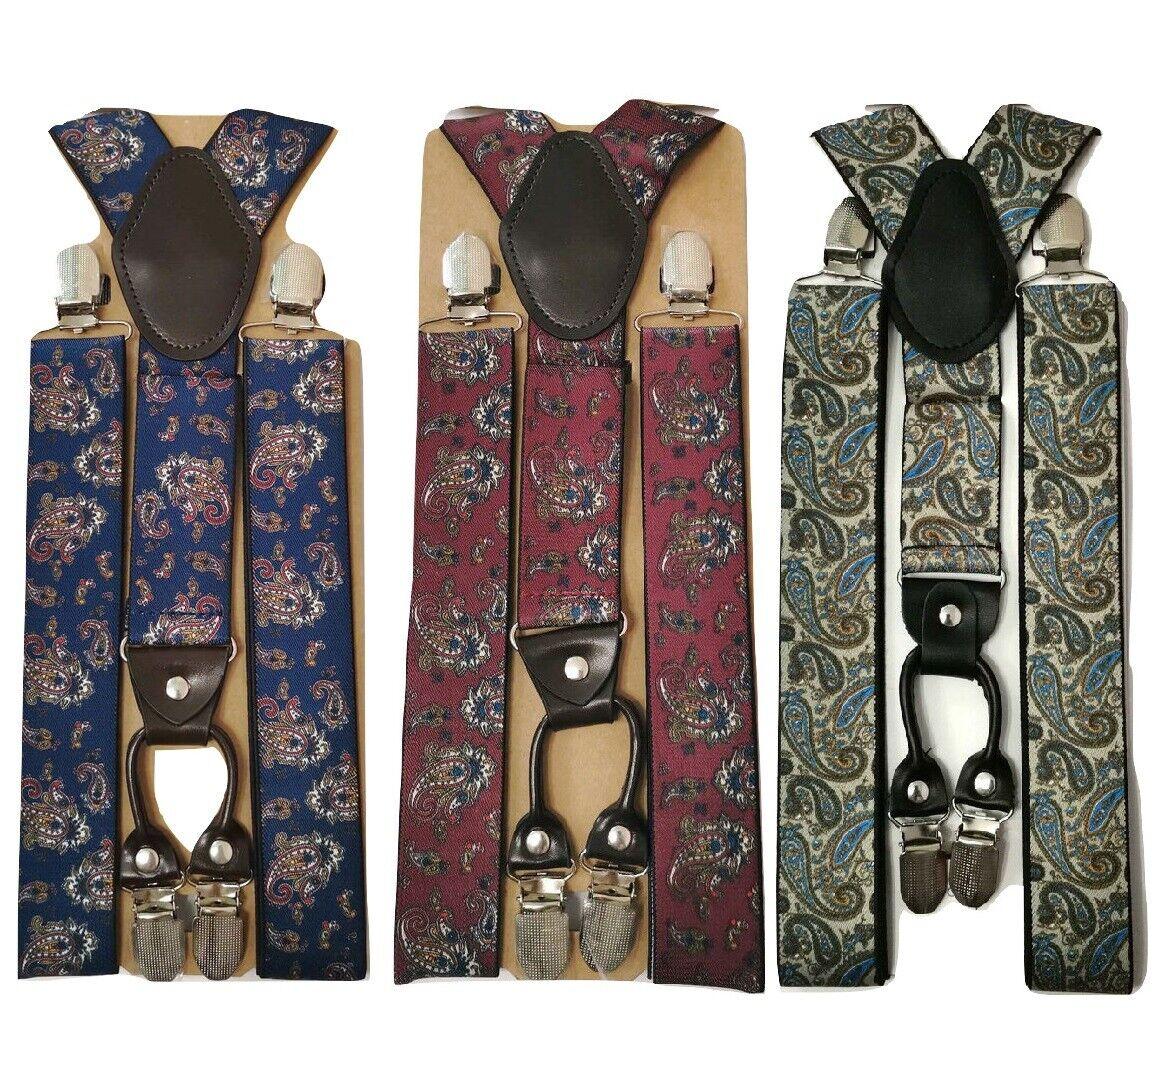 Standard Langlebig Herren Damen Hosenträger Straps Elastisch 3.5cm Breit Paisley